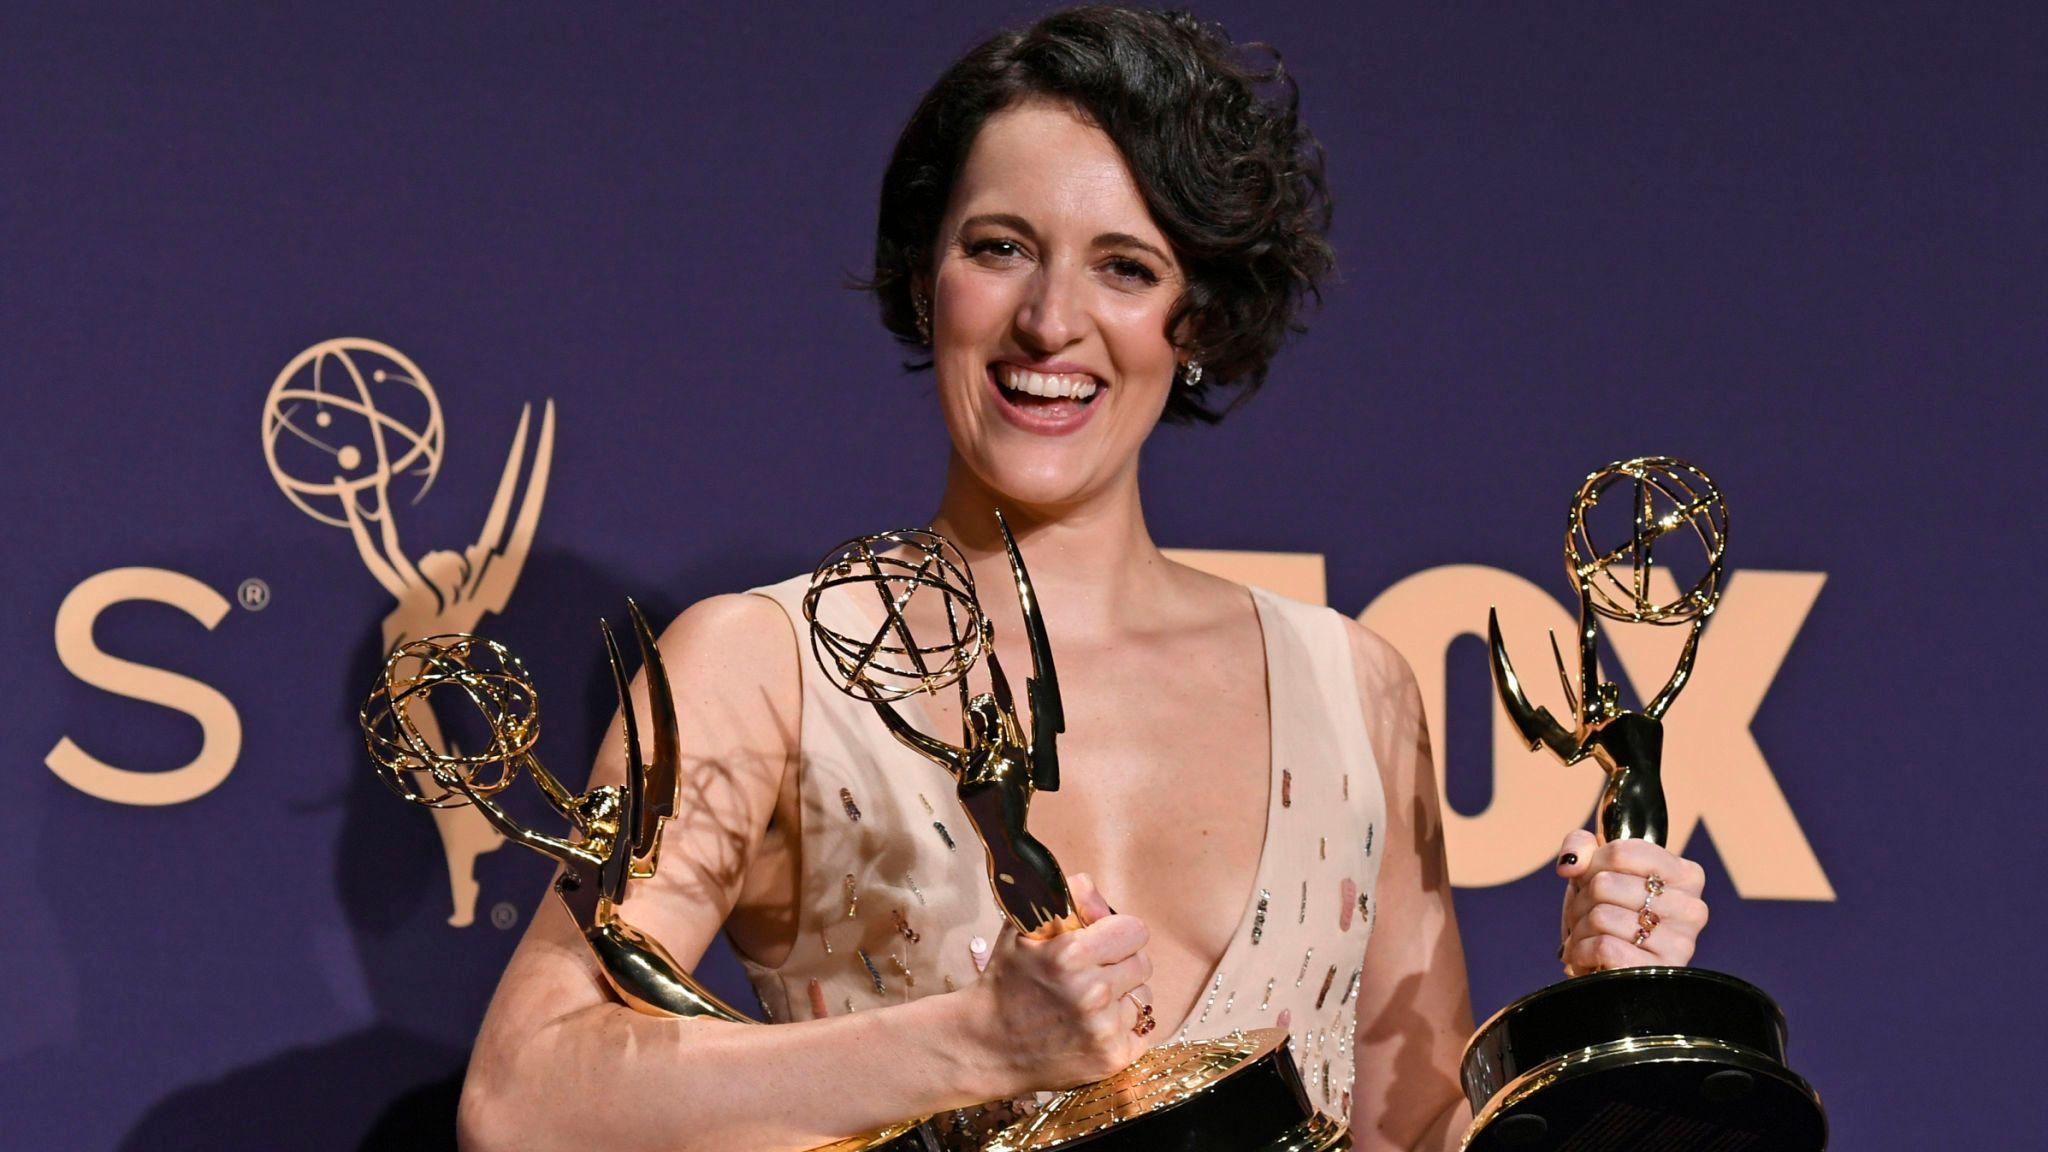 Fleabag star Phoebe Waller-Bridge wins three awards at the Emmys